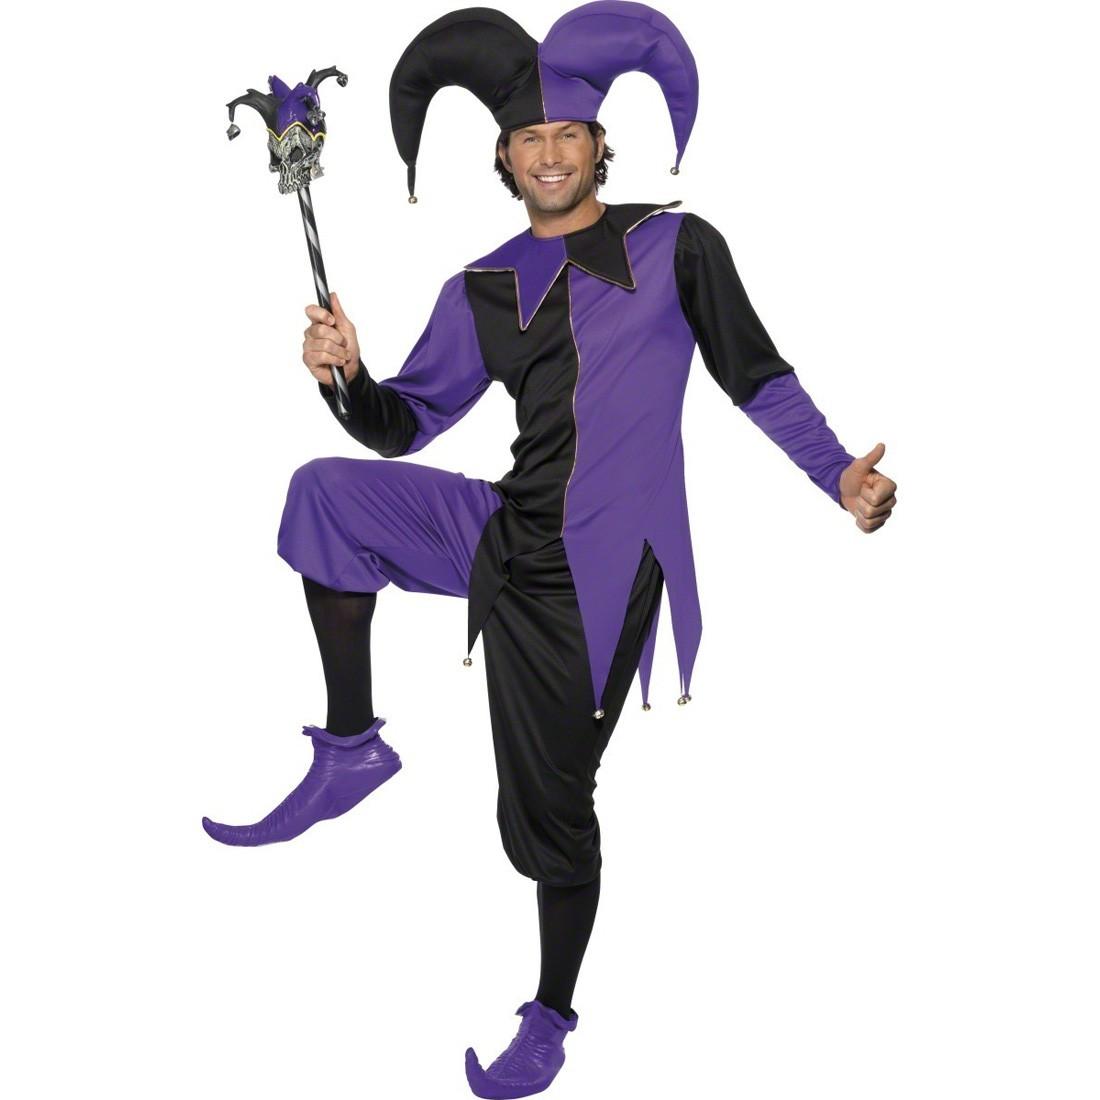 Narren kostüm schwarz lila m 48/50 narrenkostüm gaukler kostüm ...